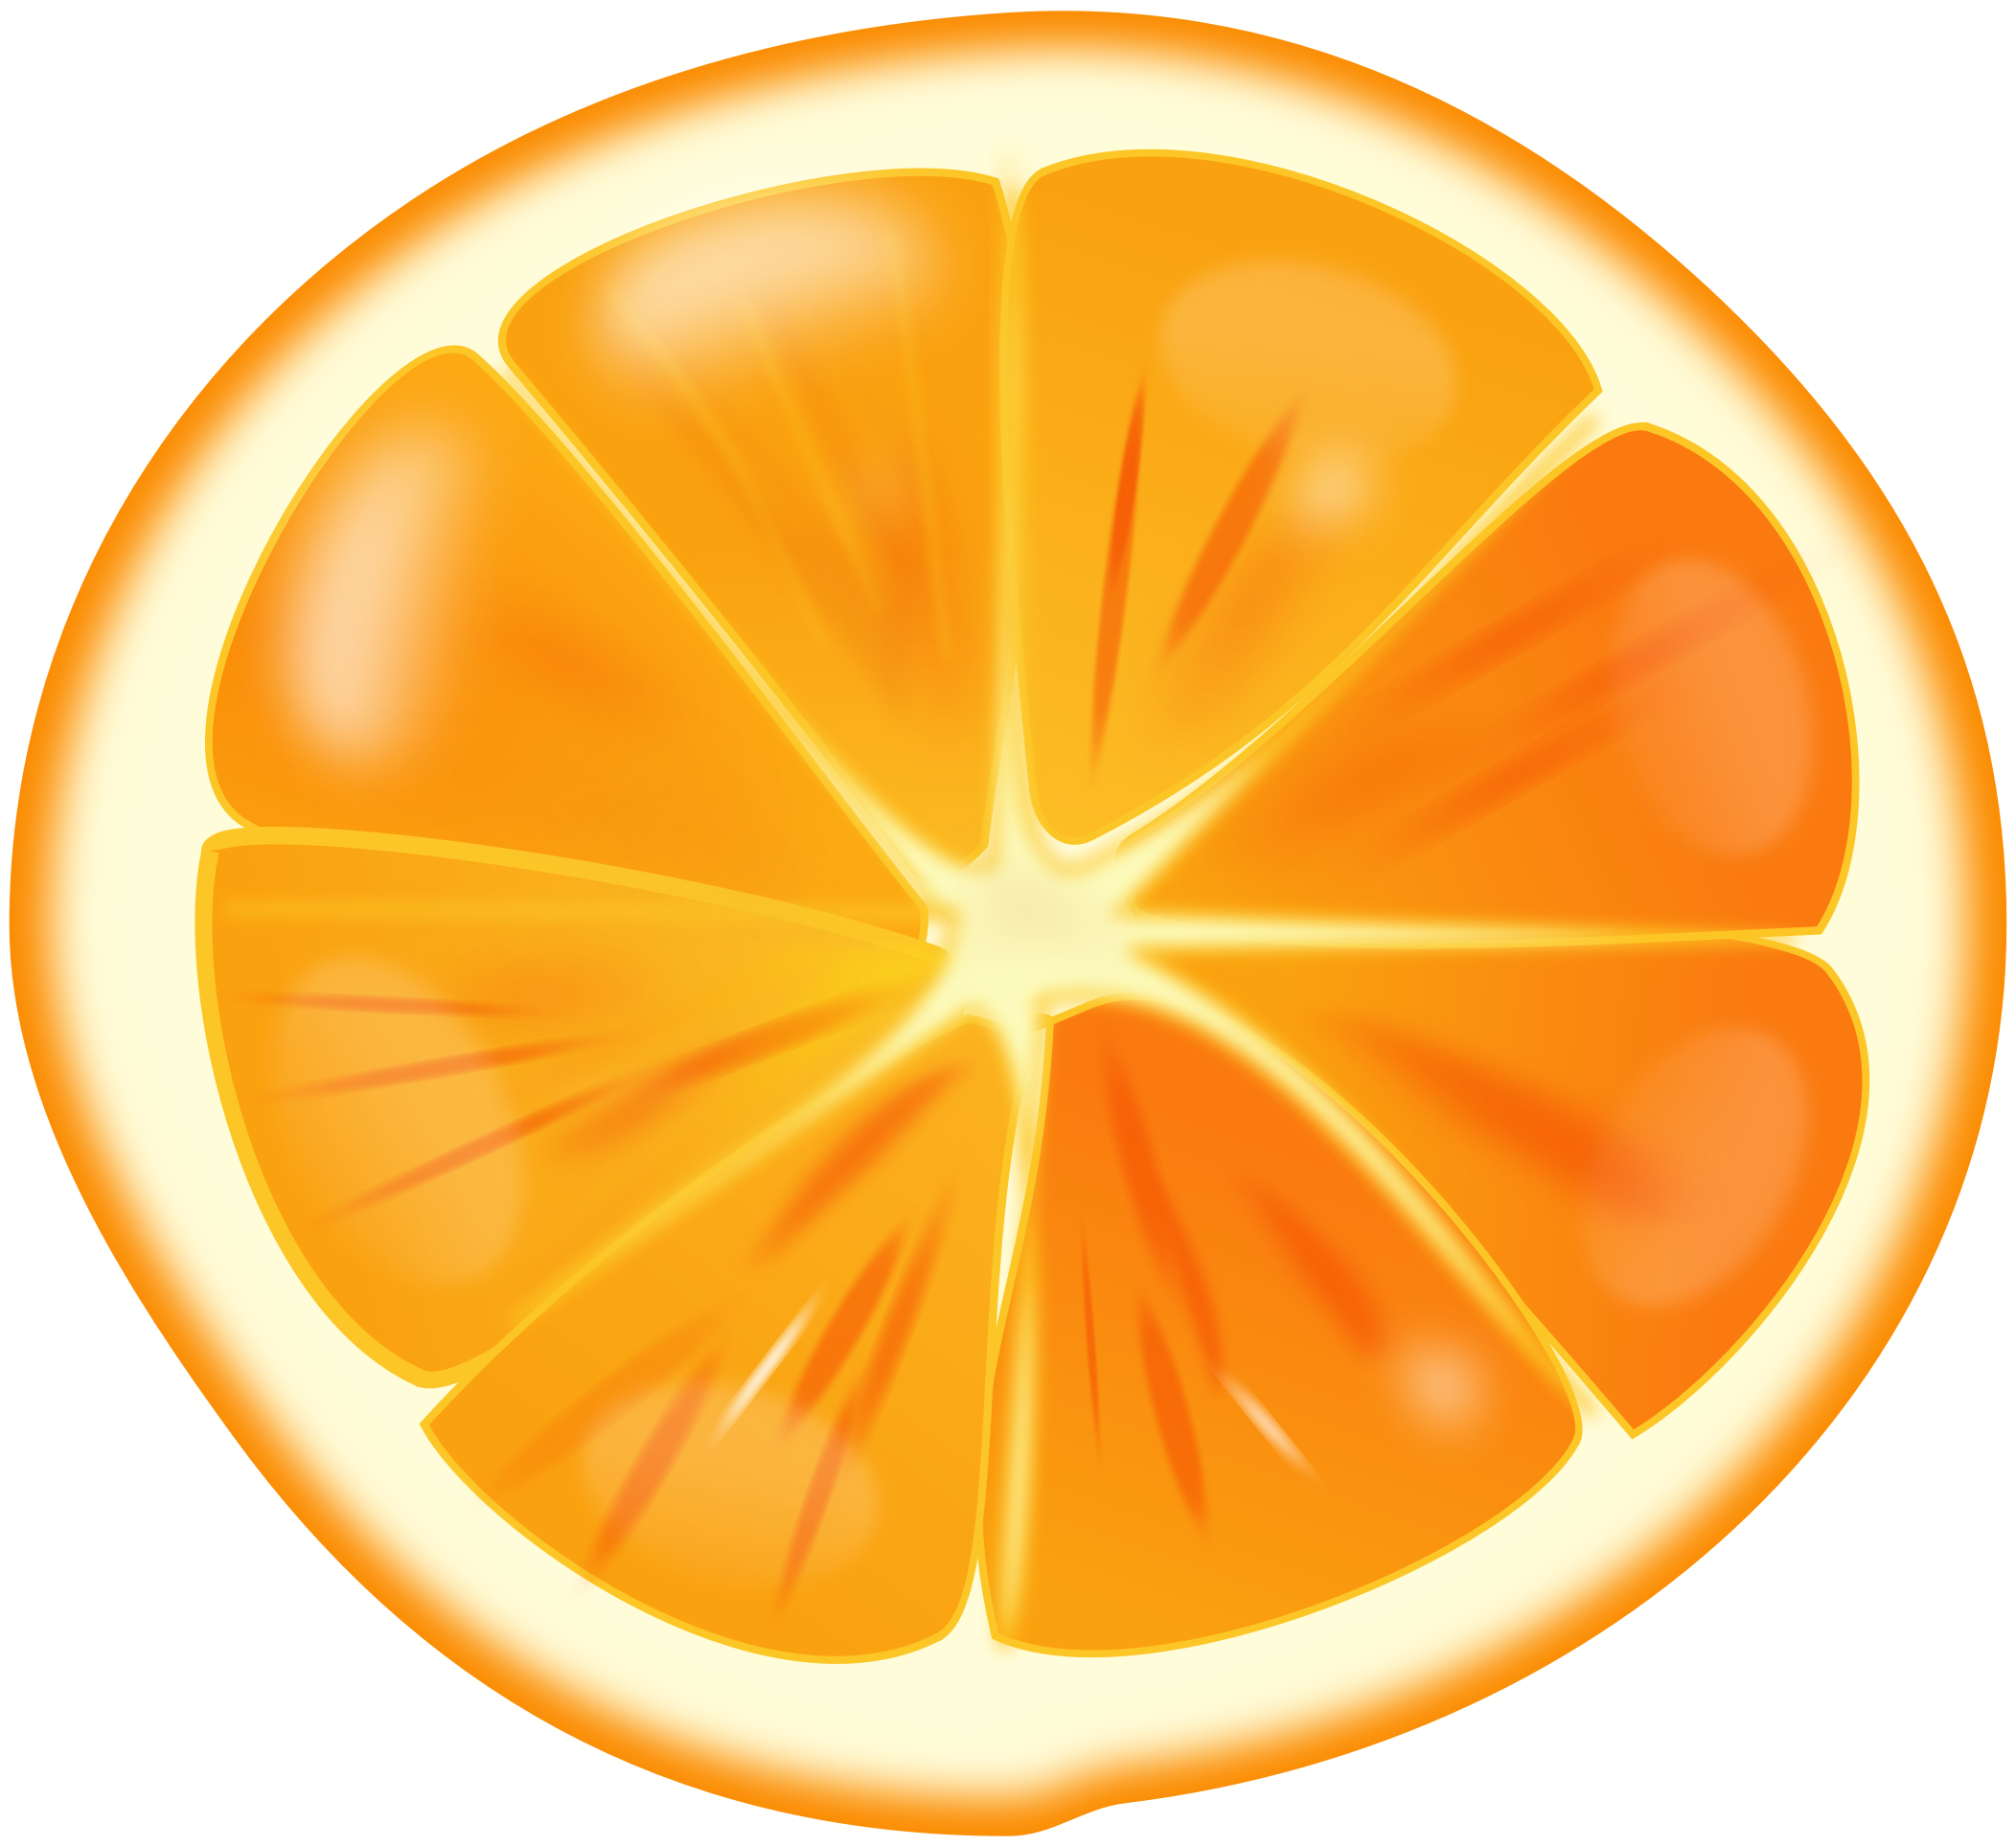 clipart orange slice rh openclipart org clipart orangen clipart orange gratuit